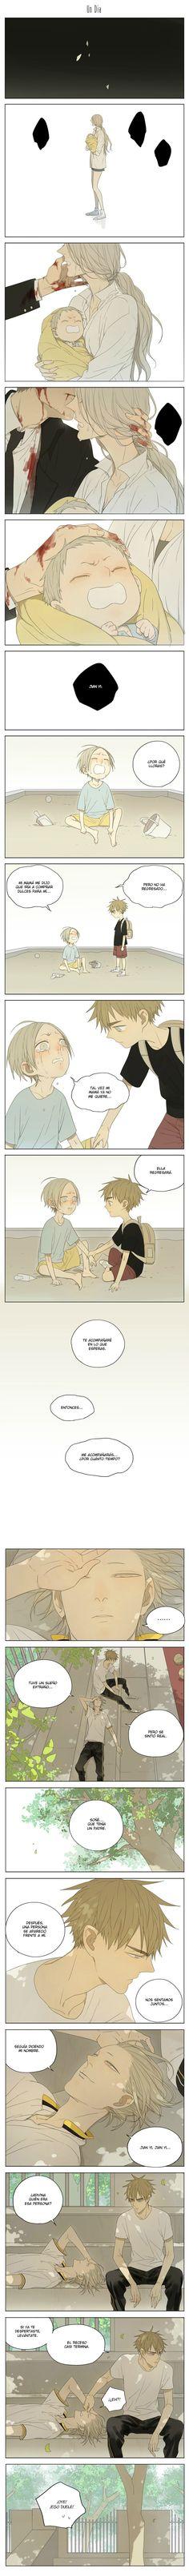 19 Days Capítulo 6 página 1 (Cargar imágenes: 6) - Leer Manga en Español gratis en NineManga.com